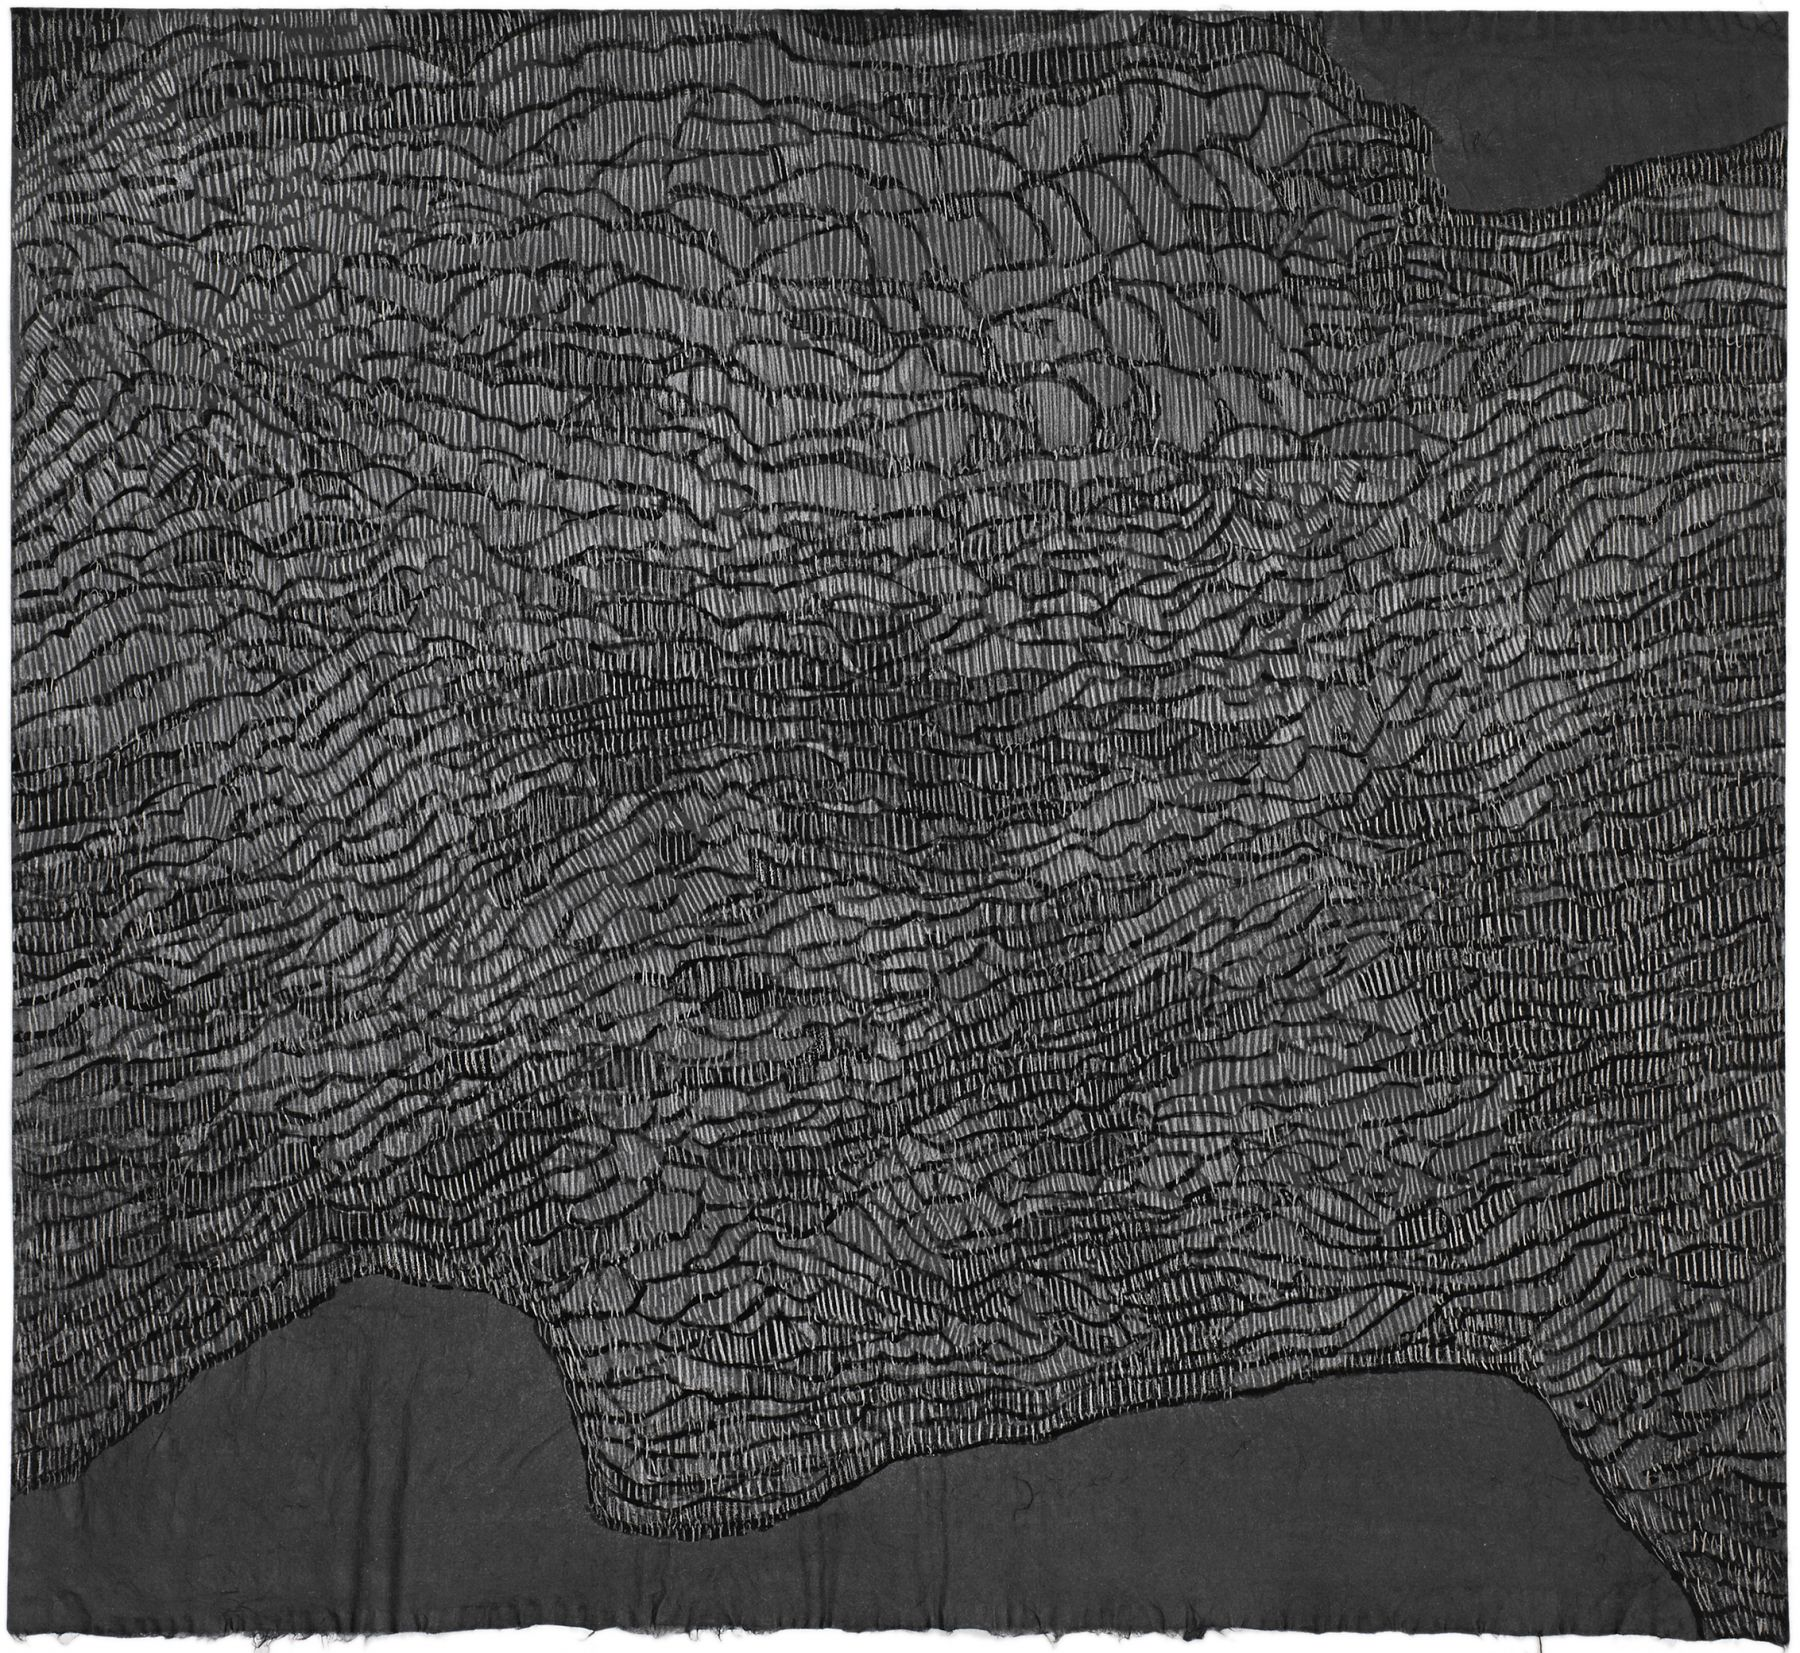 Theresa Chong, HUAN (Dispersion), 2014